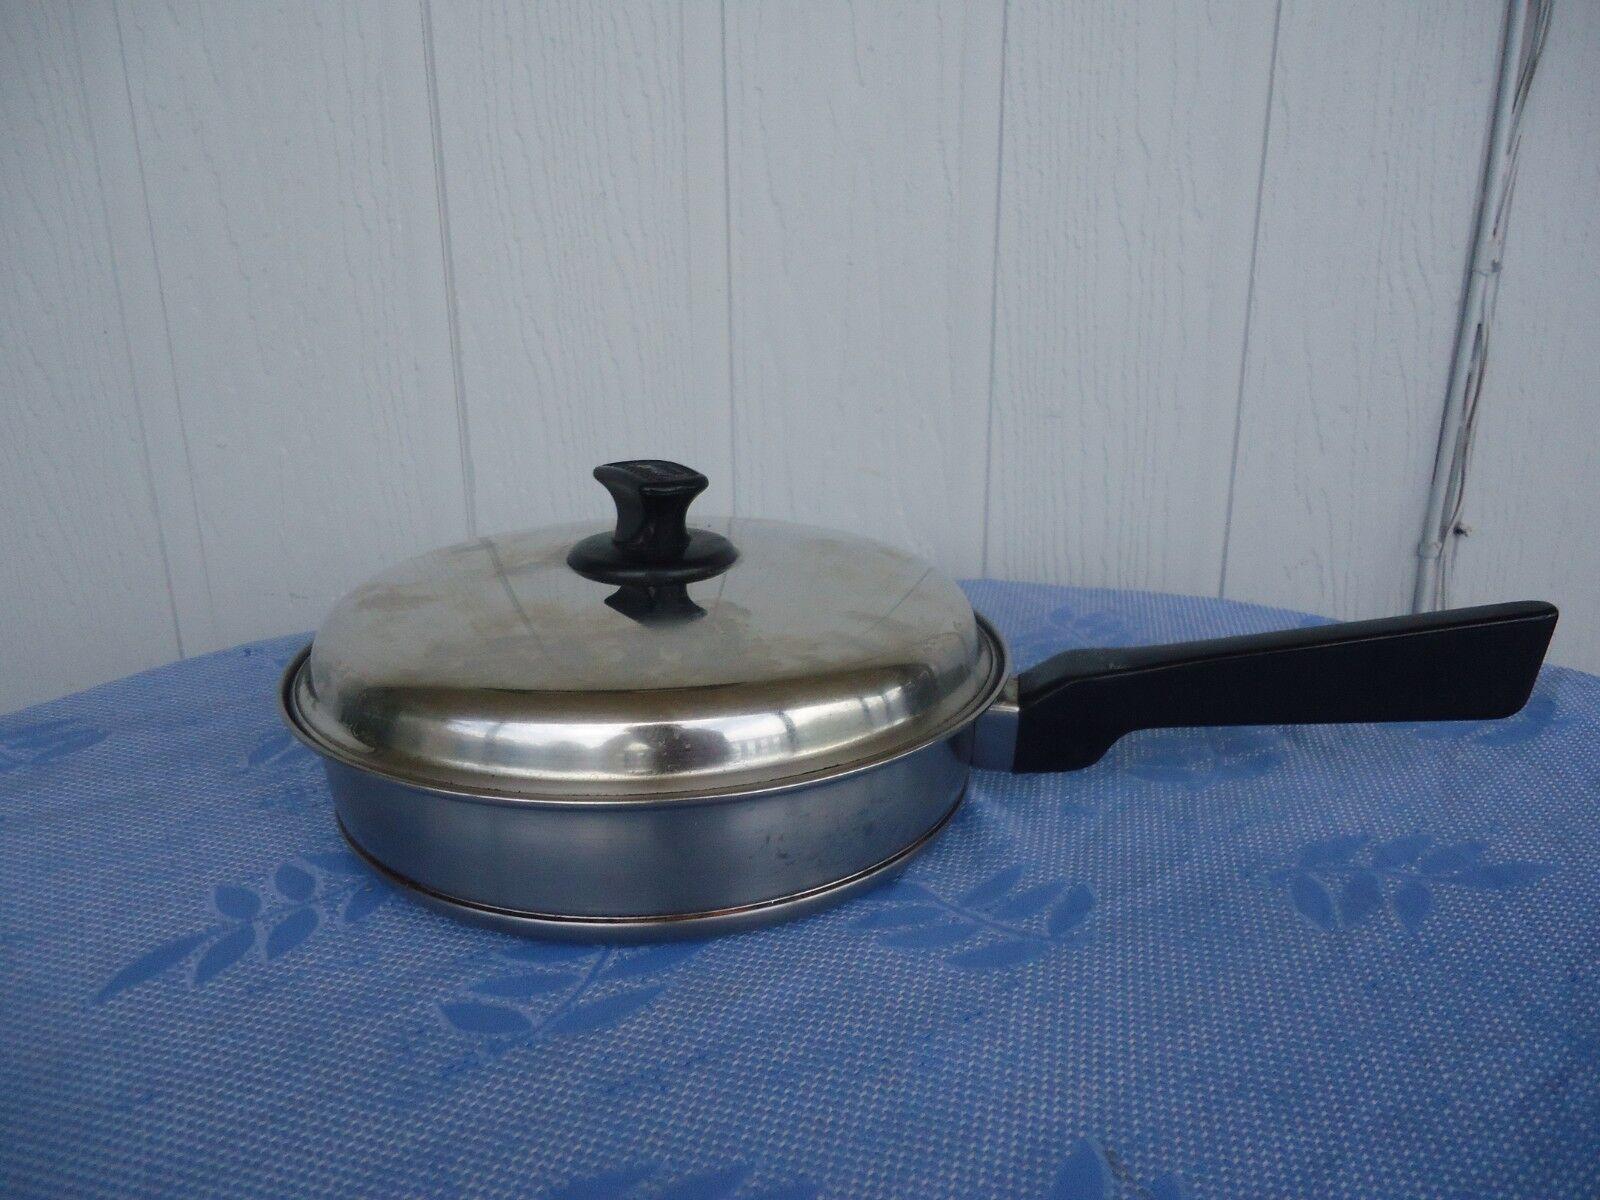 Vintage essteele brand frypan & lid  silcraft stainless steel copper